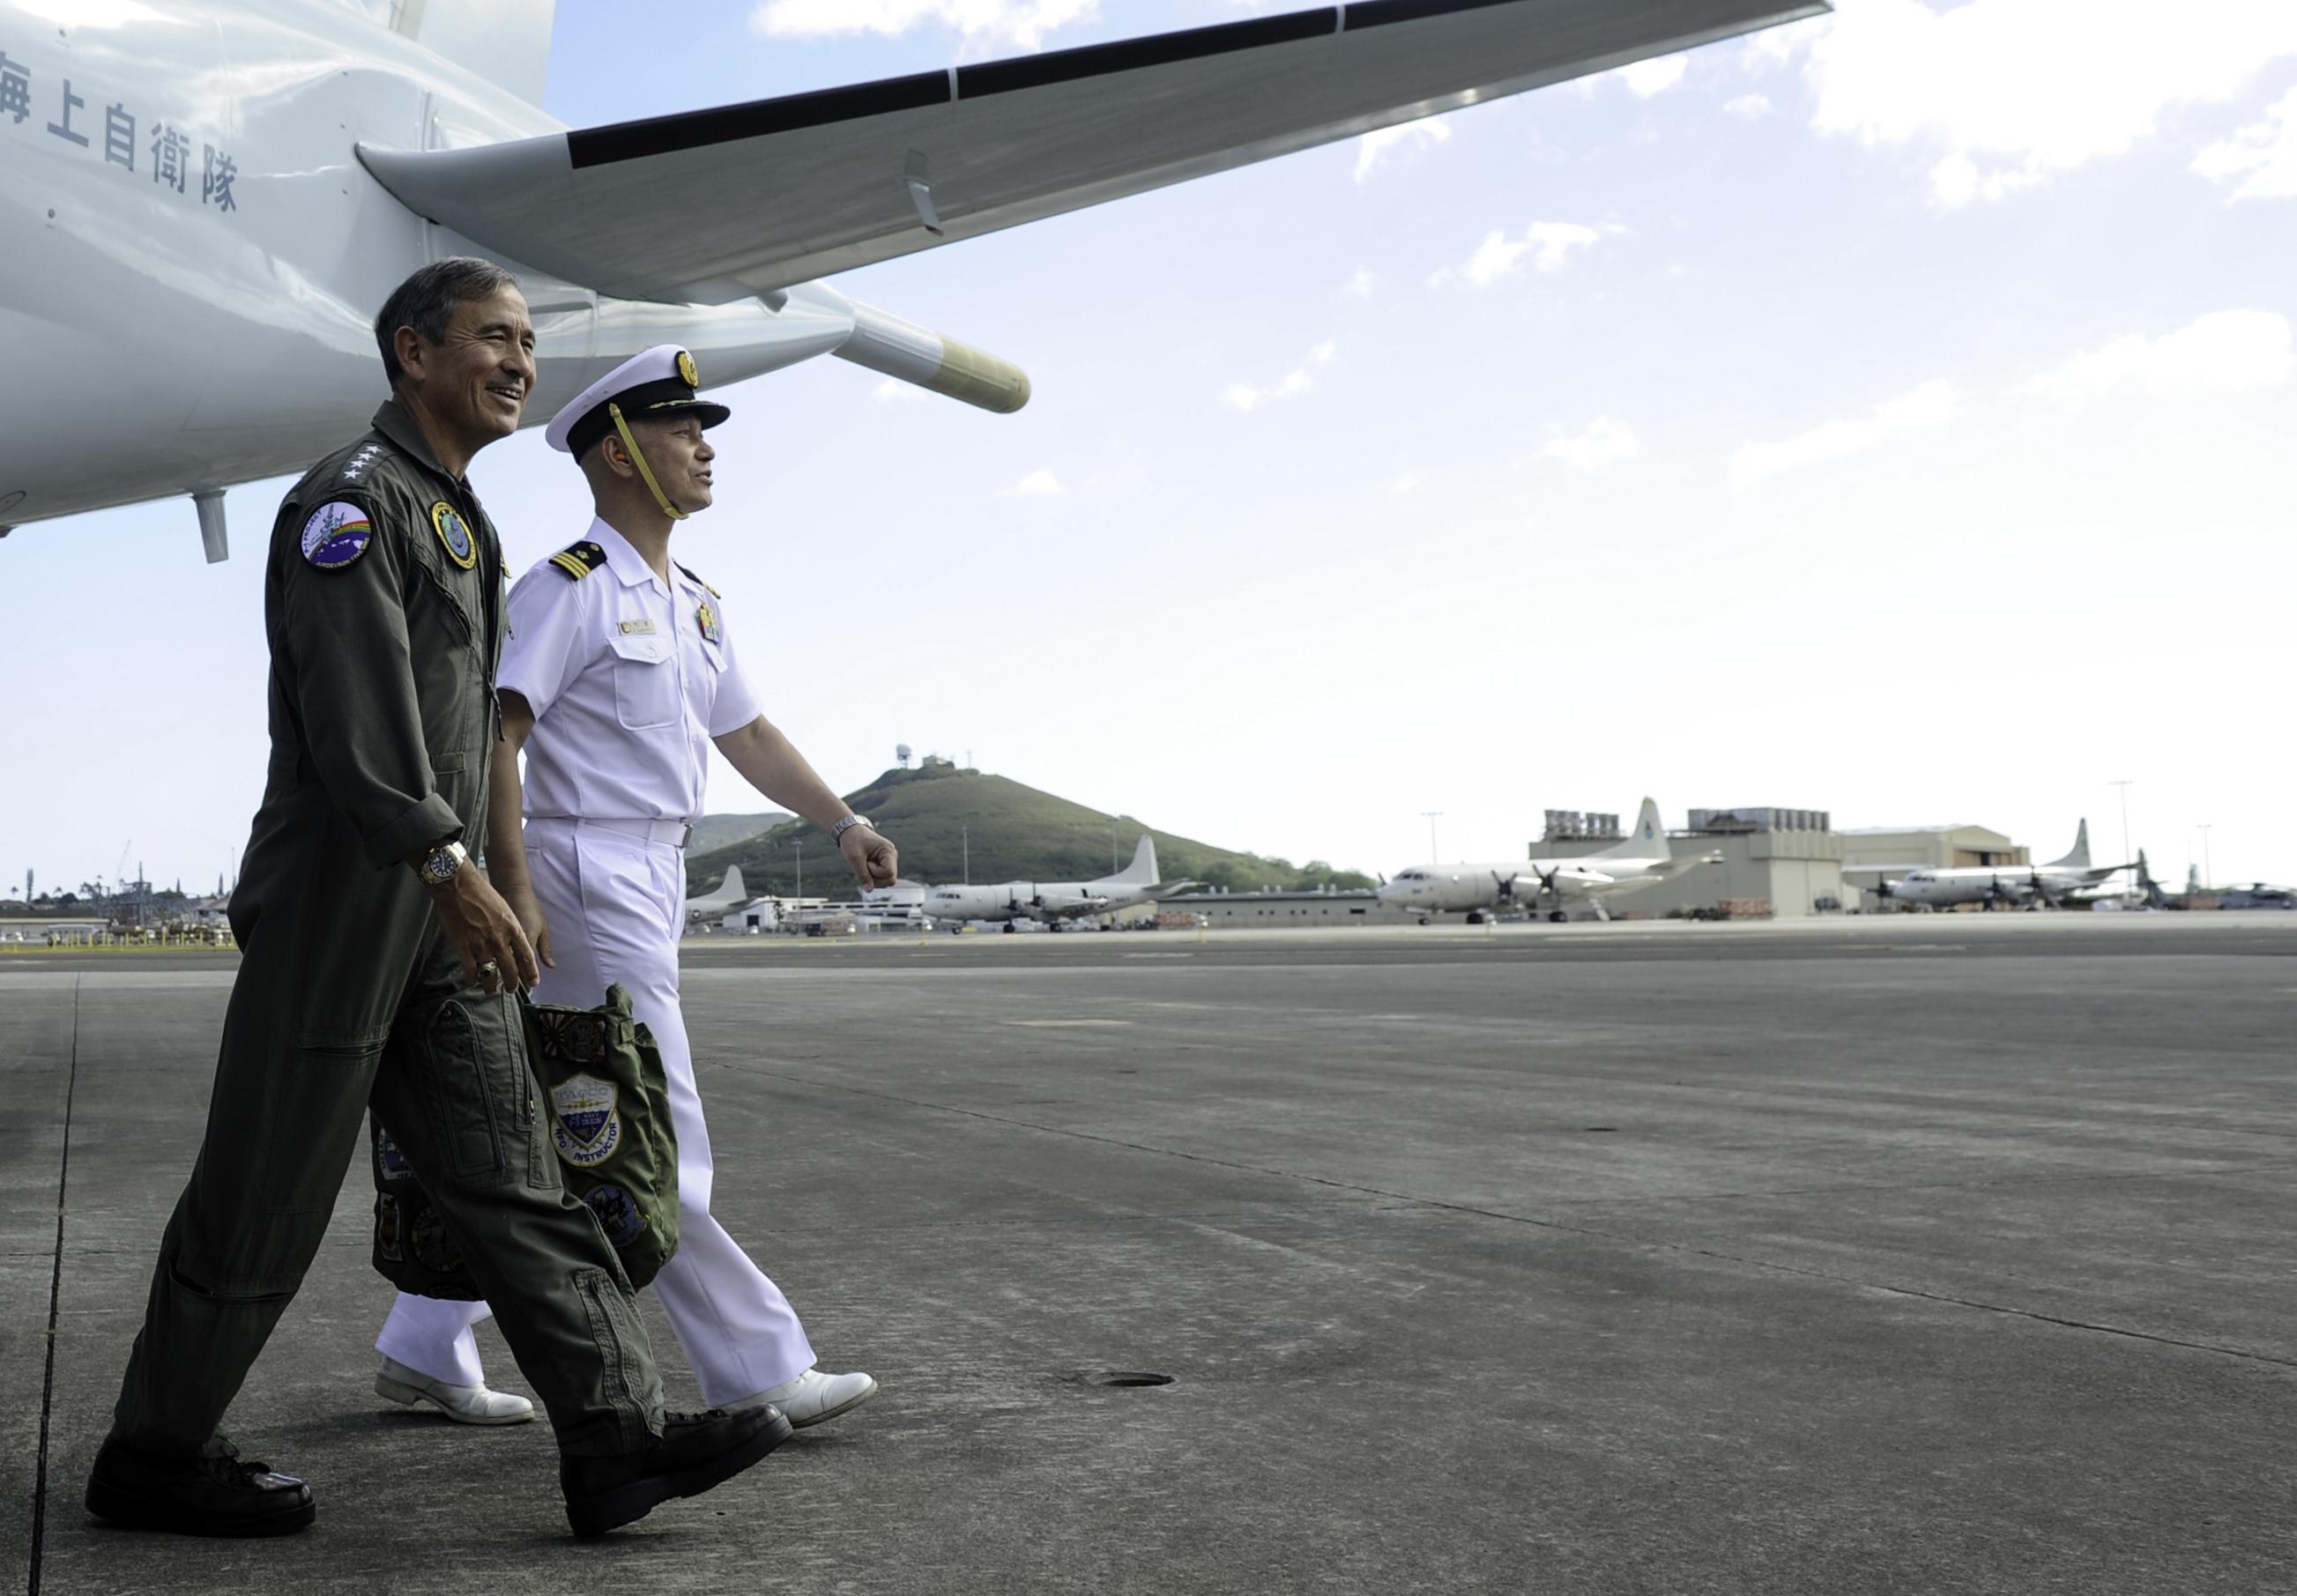 Adm. Harry B. Harris Jr., commander of U.S. Pacific Fleet, walks with Japan Maritime Self-Defense Force Cmdr. Kazutaka Sugimoto on Feb. 6, 2015. US Navy Photo